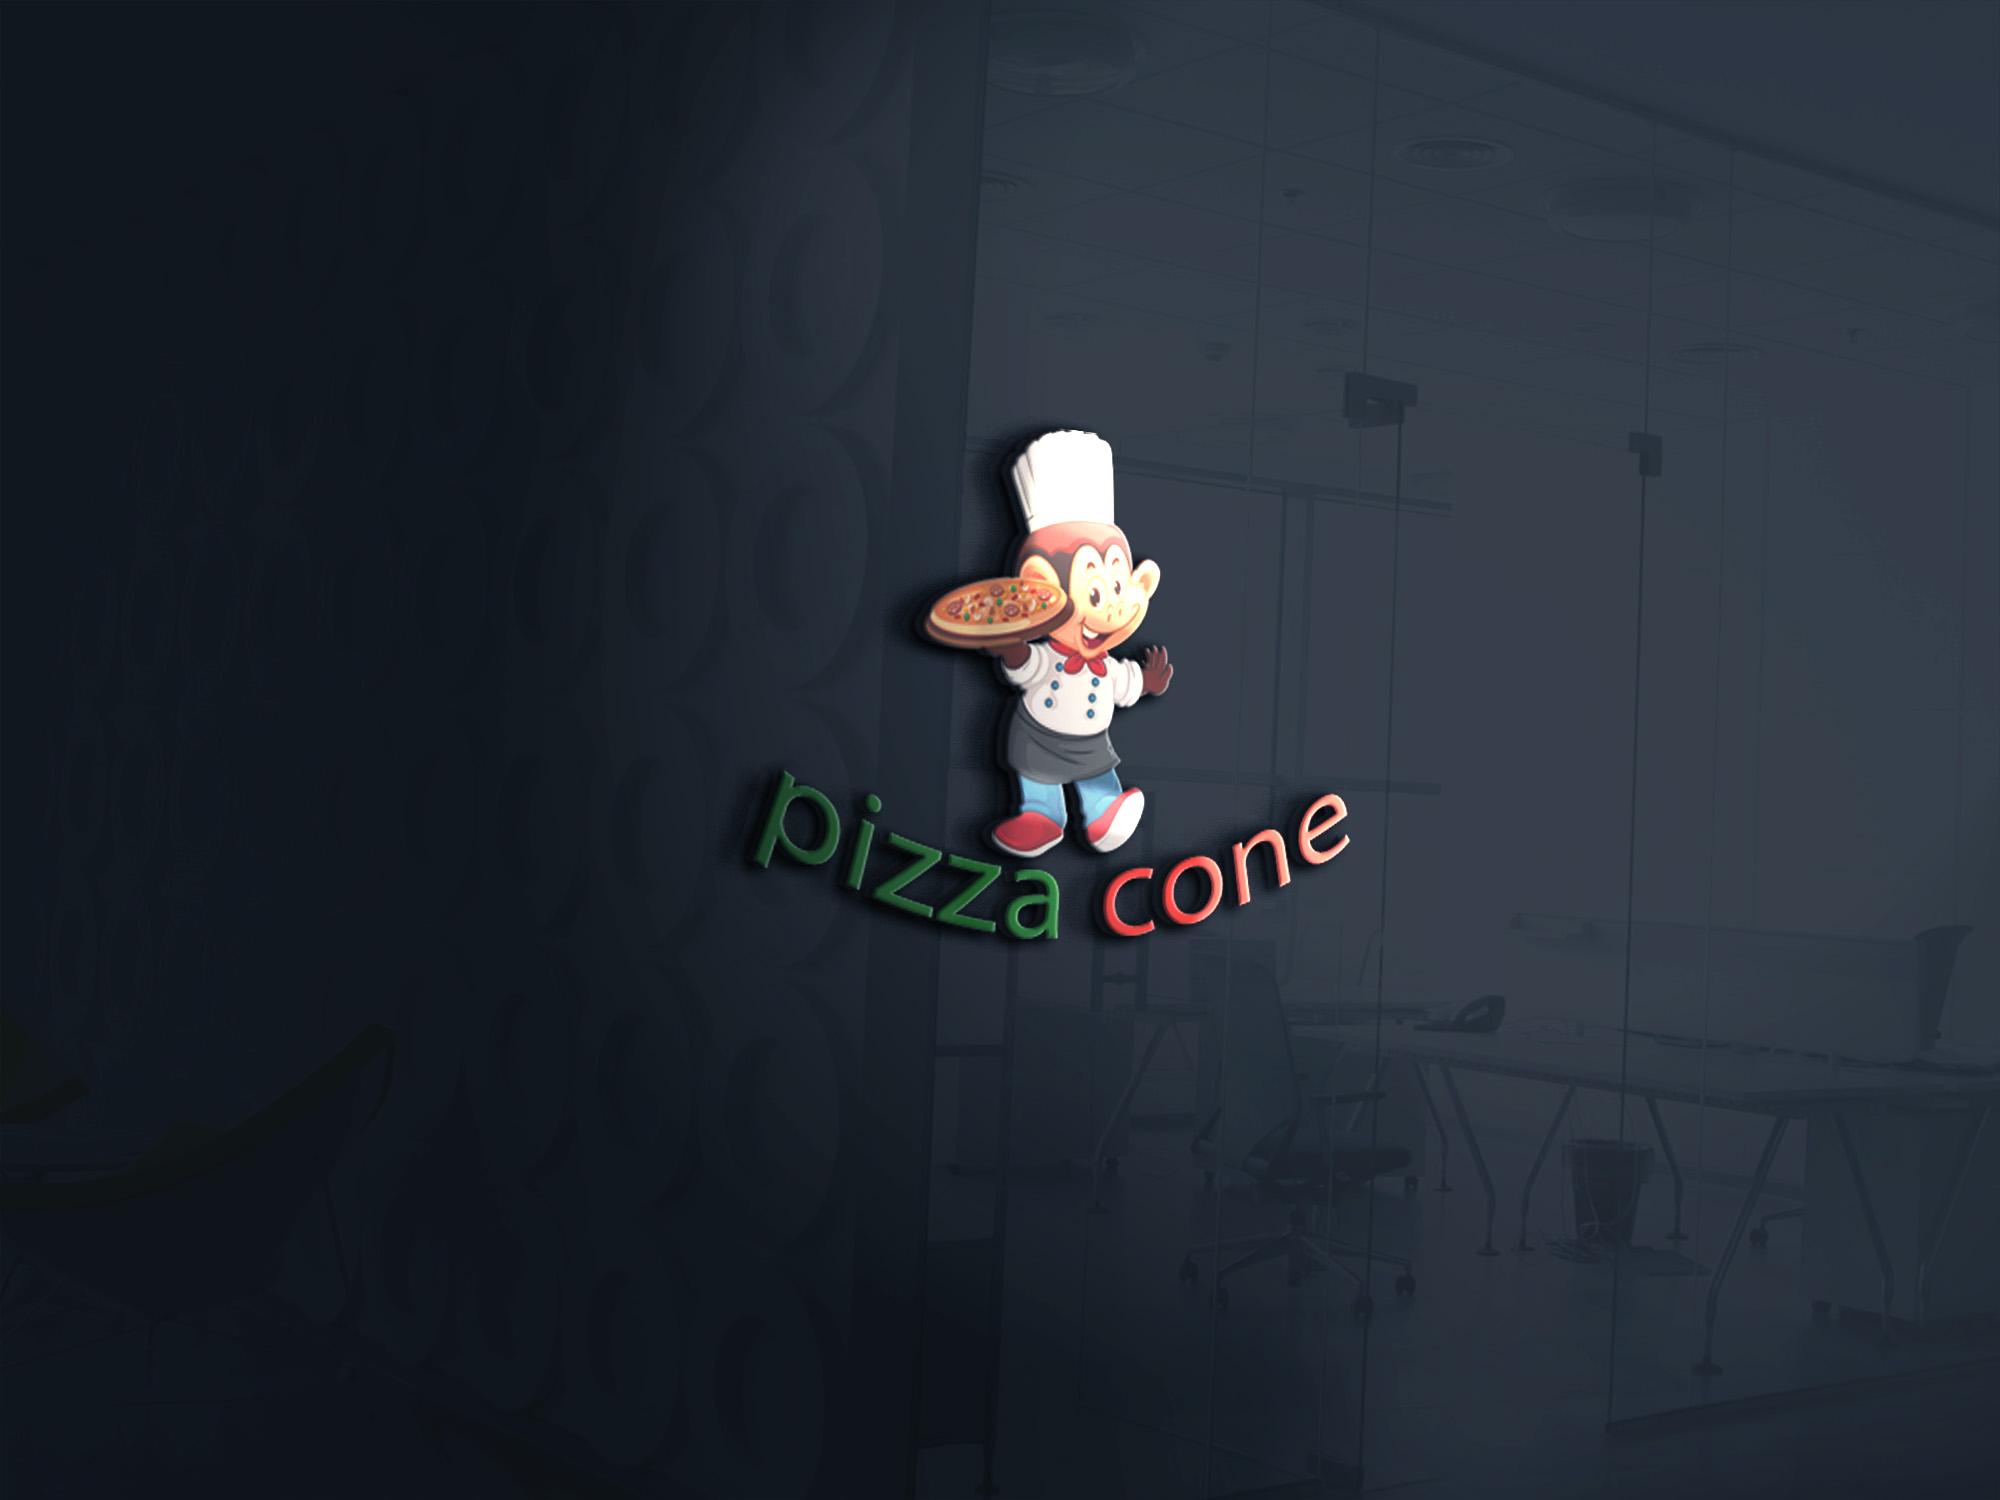 لوجو لمحل بيتزا